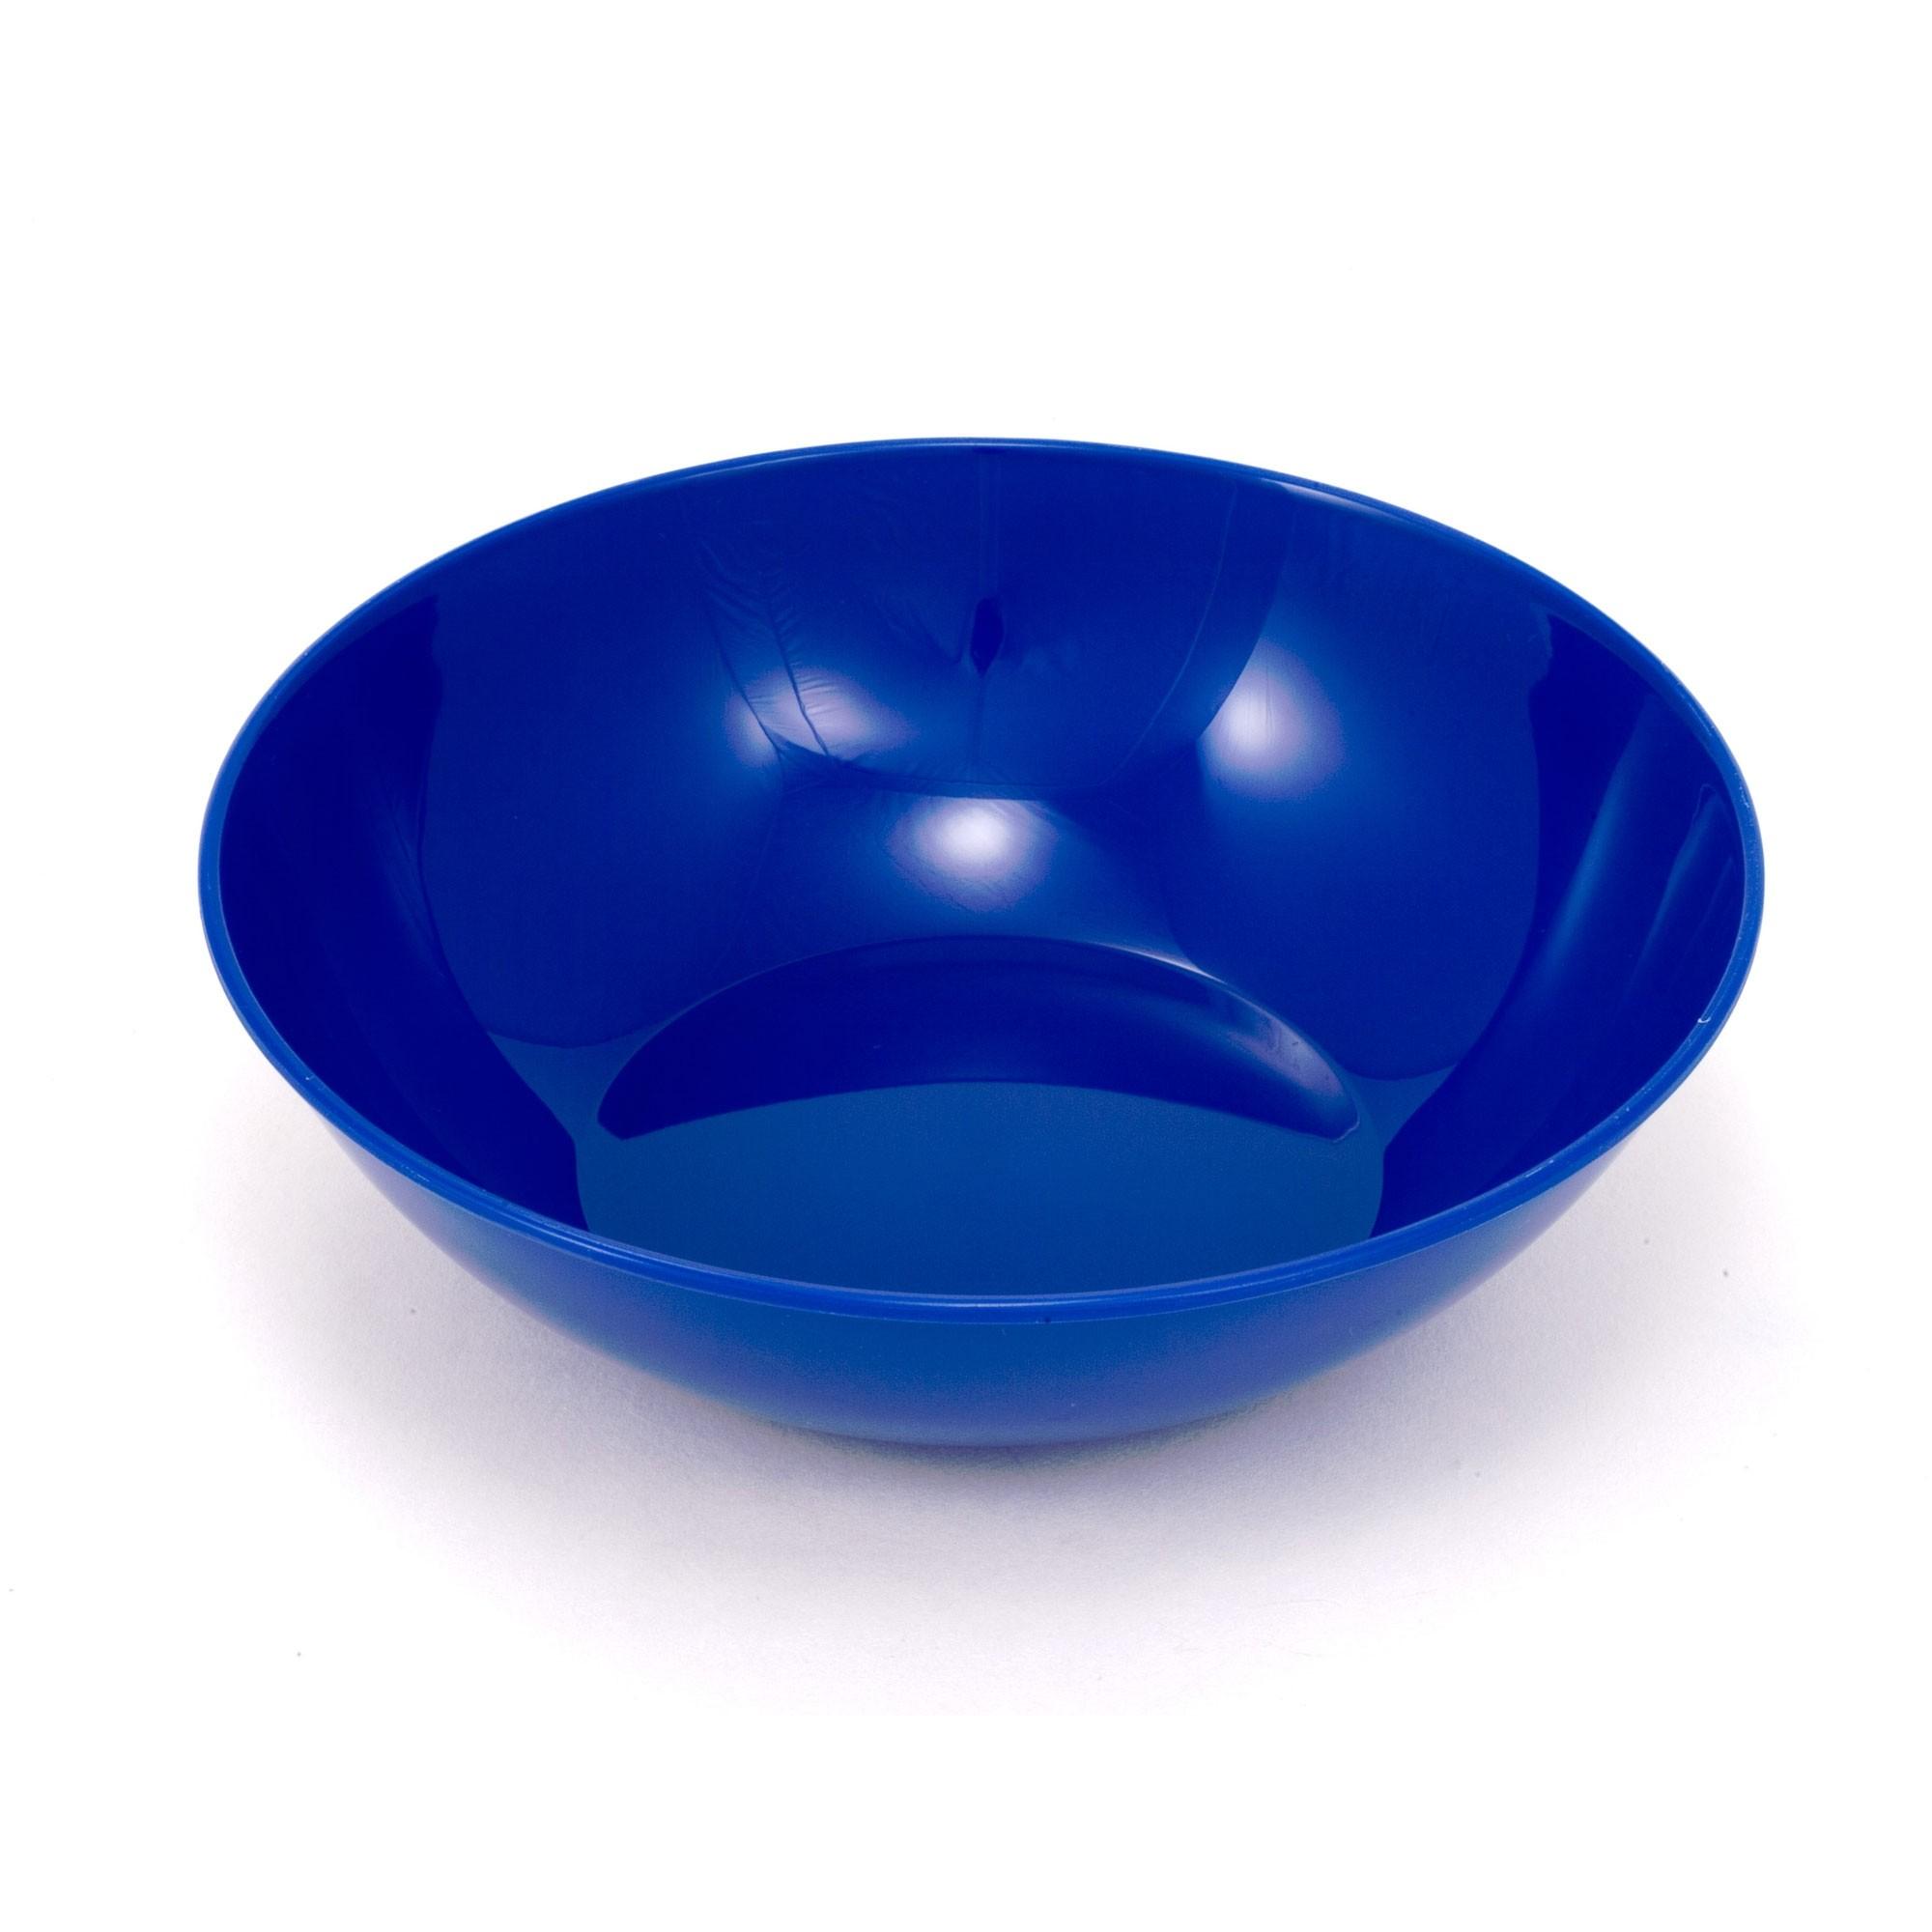 GSI Cascadian Bowl - Blue